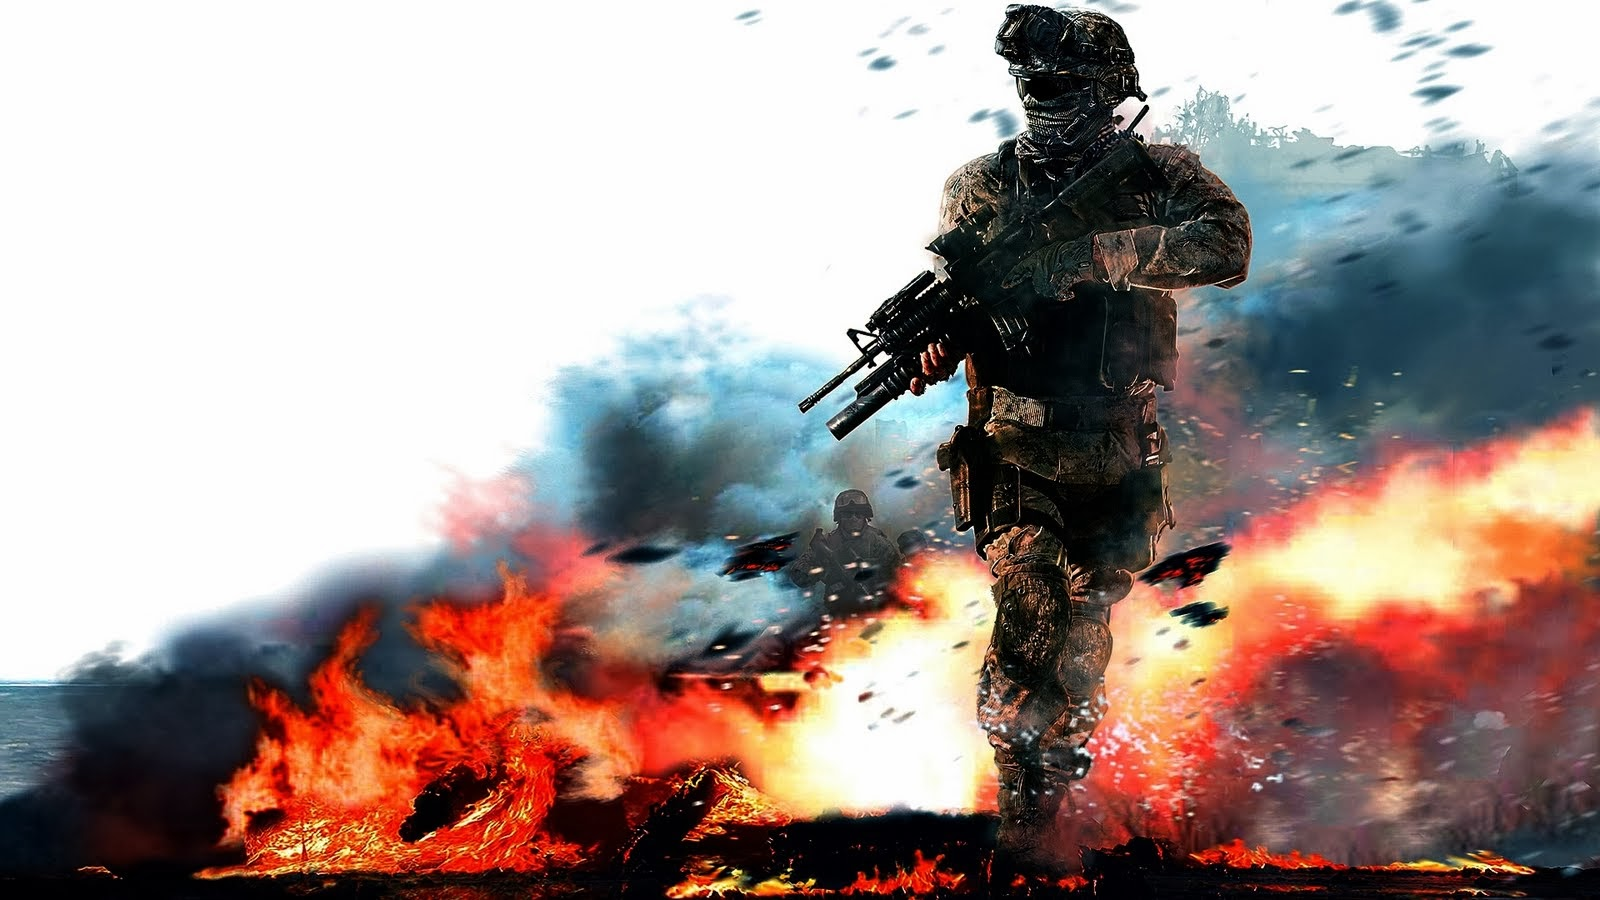 Call of Duty hd wallpaper ~ HD WALLPAPERS